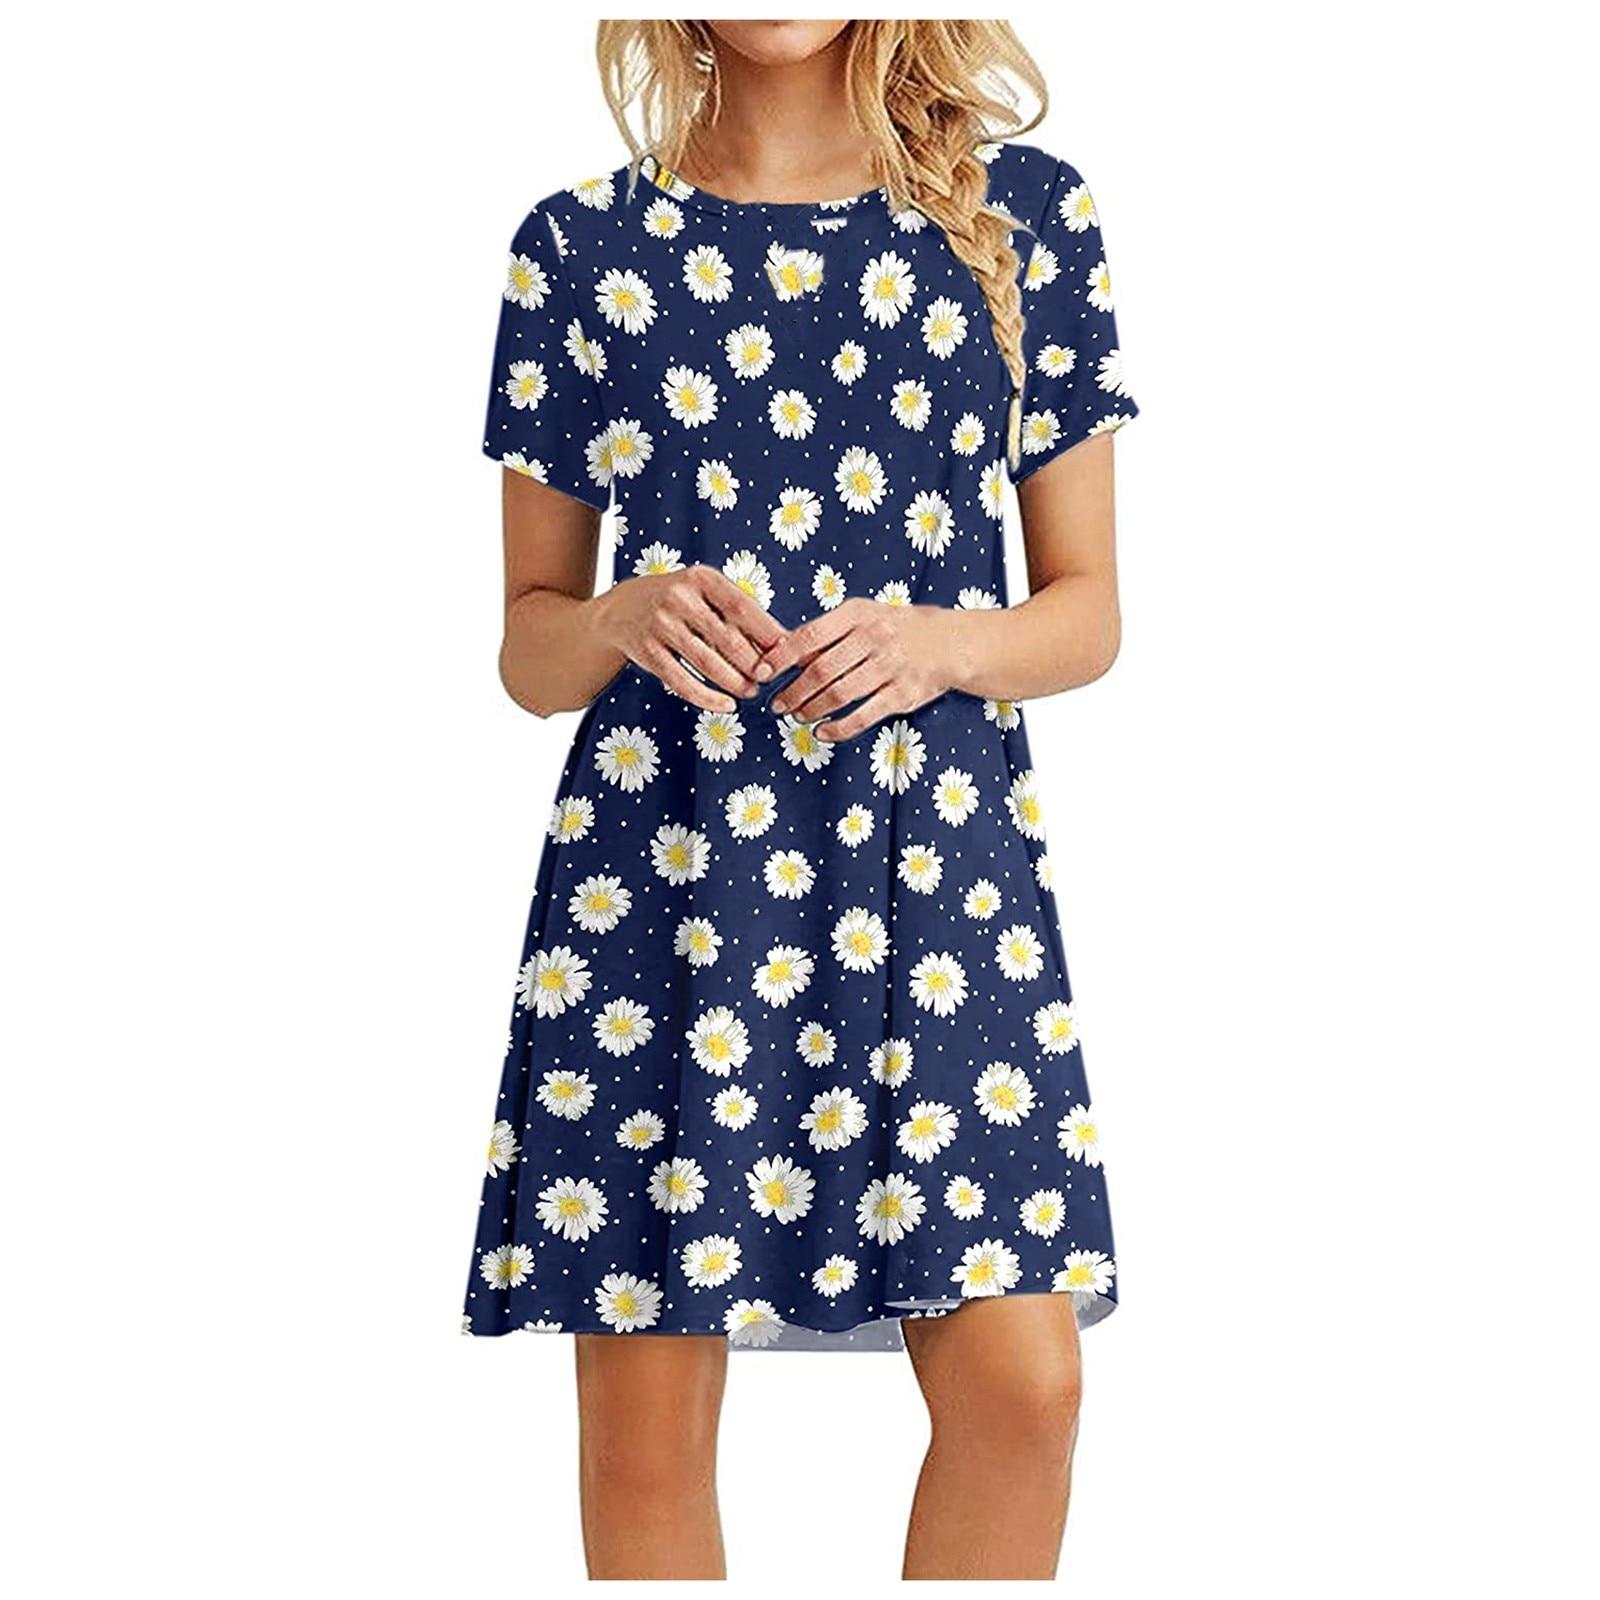 Women's Summer Casual Tshirt Dresses Short Sleeve Boho Beach Dress 4